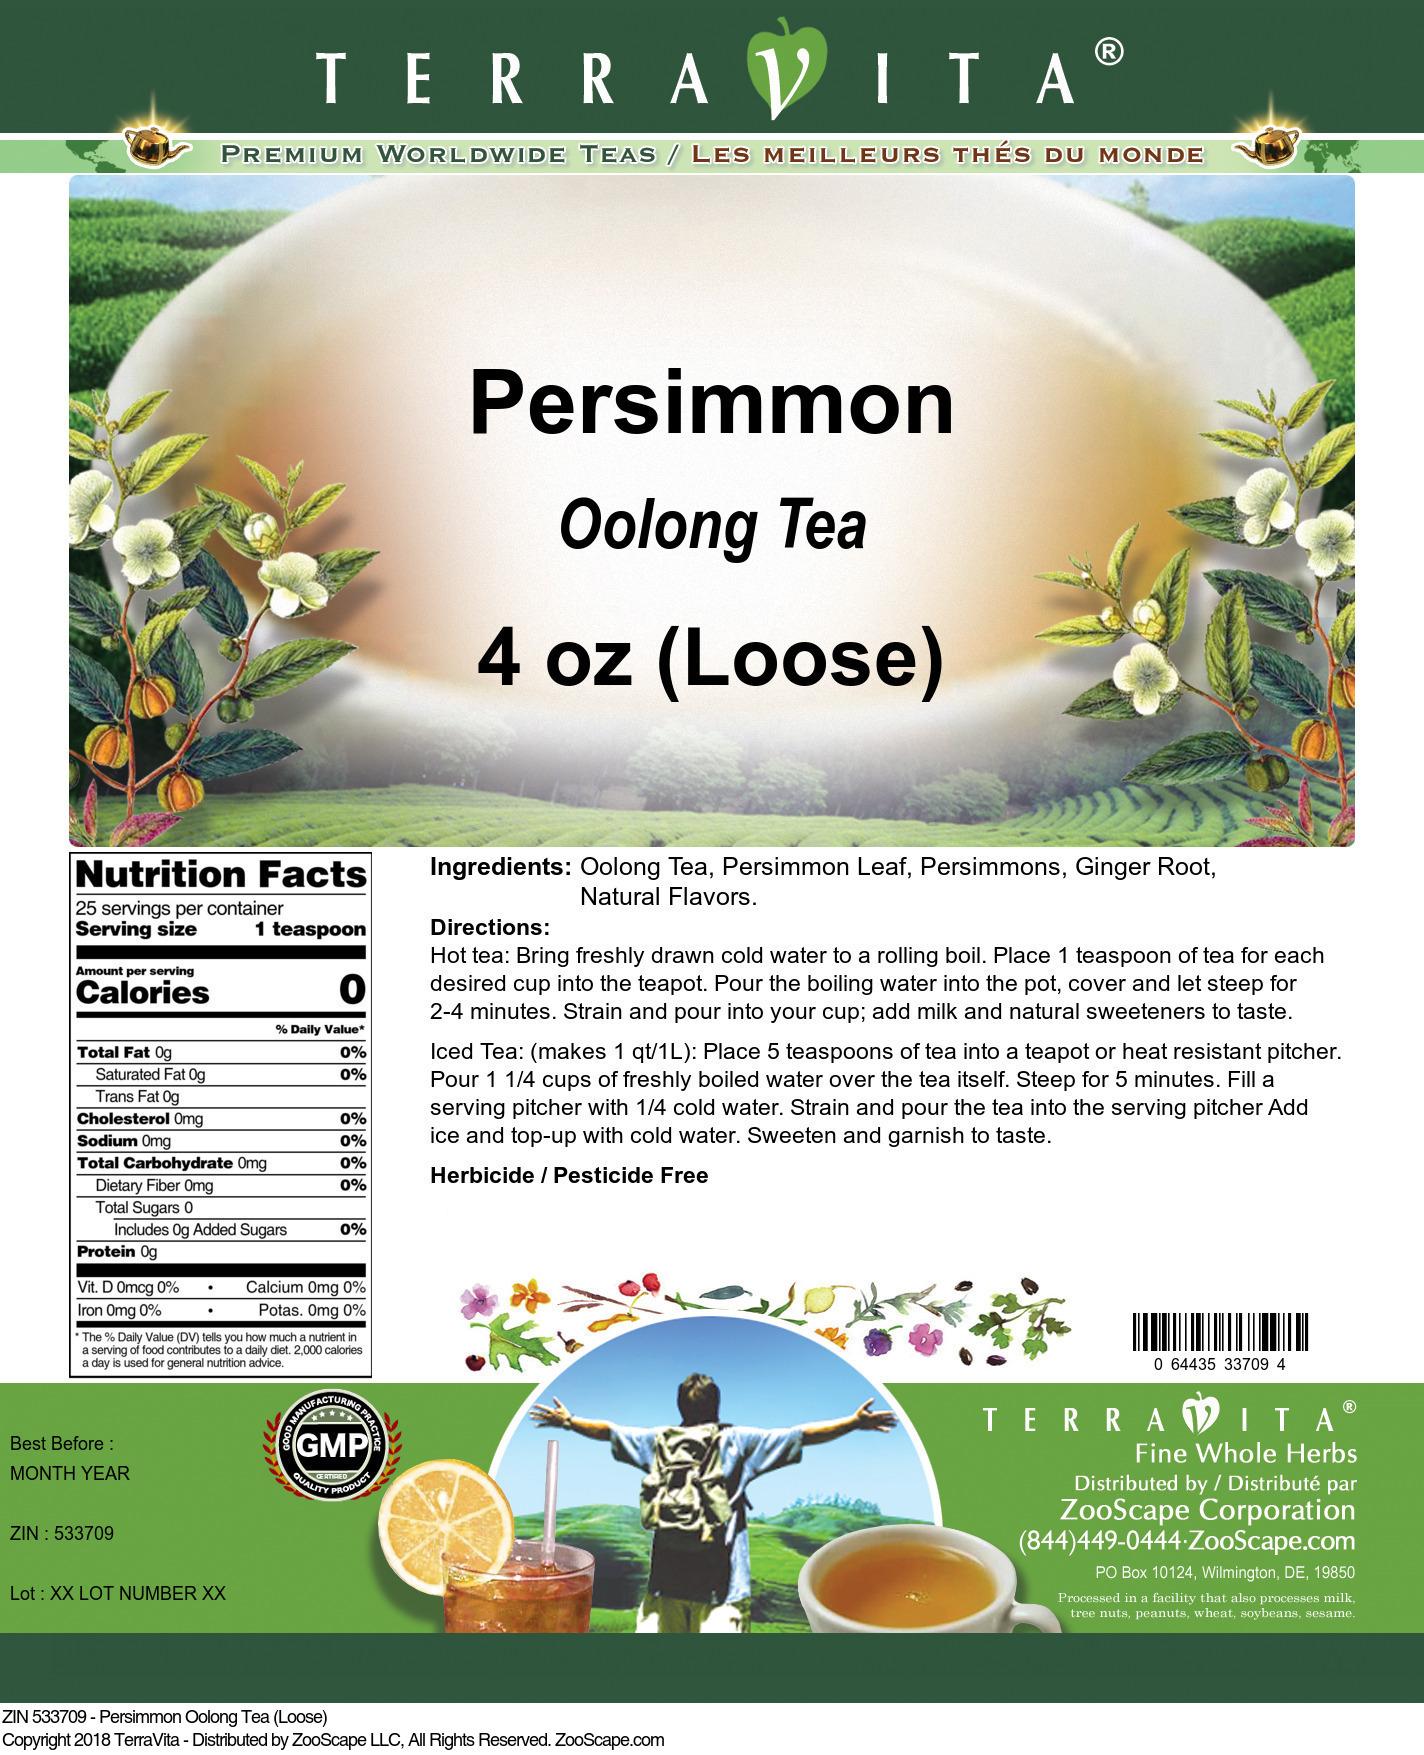 Persimmon Oolong Tea